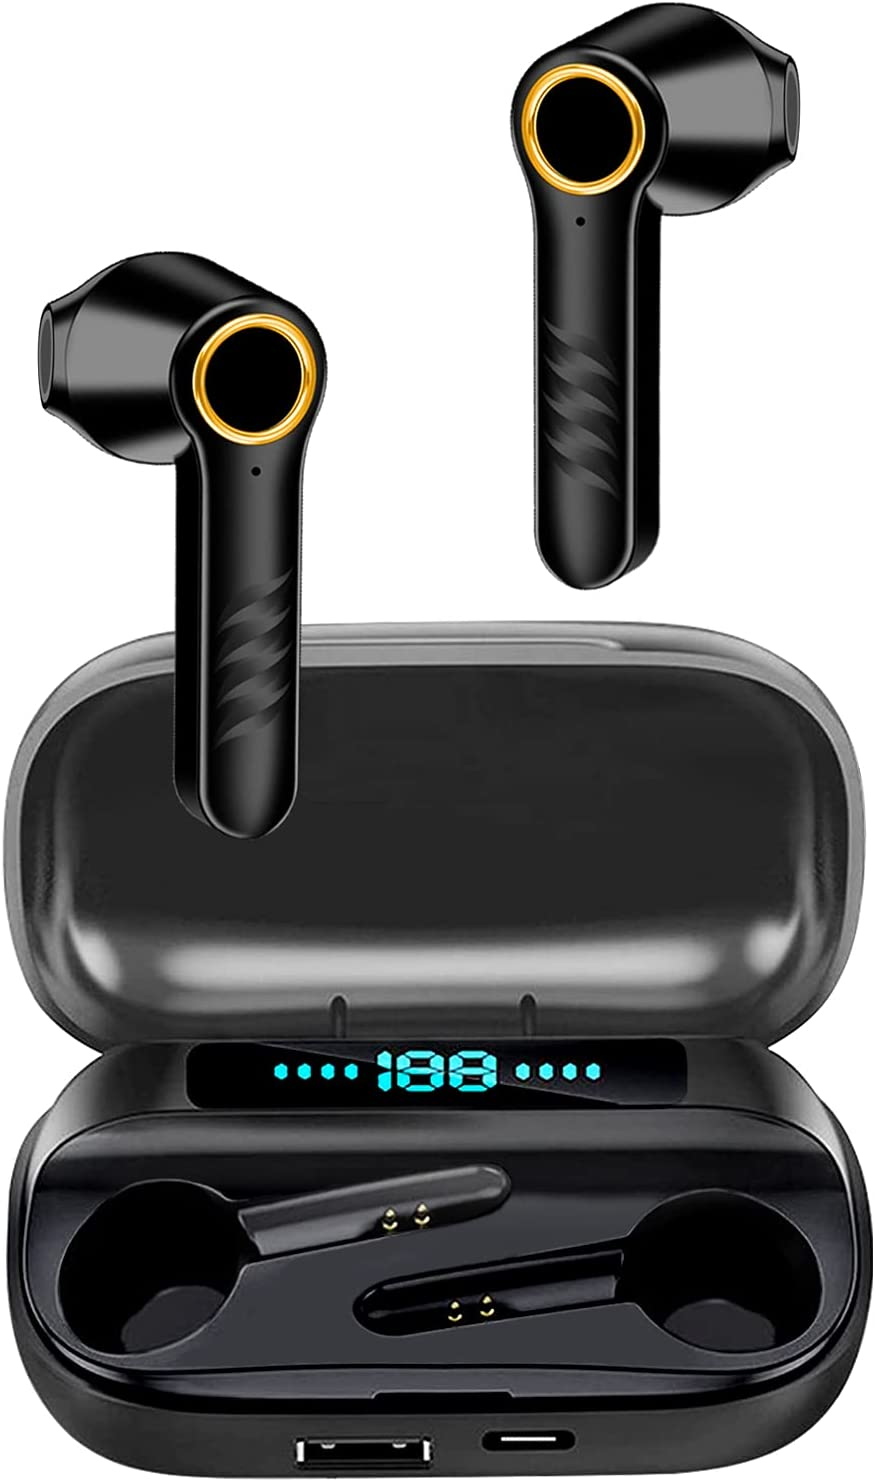 Wireless Earbuds Bluetooth Headphones 36H Play Back Earphones TWS Deep Bass in Ear Waterproof with Microphone Led Display